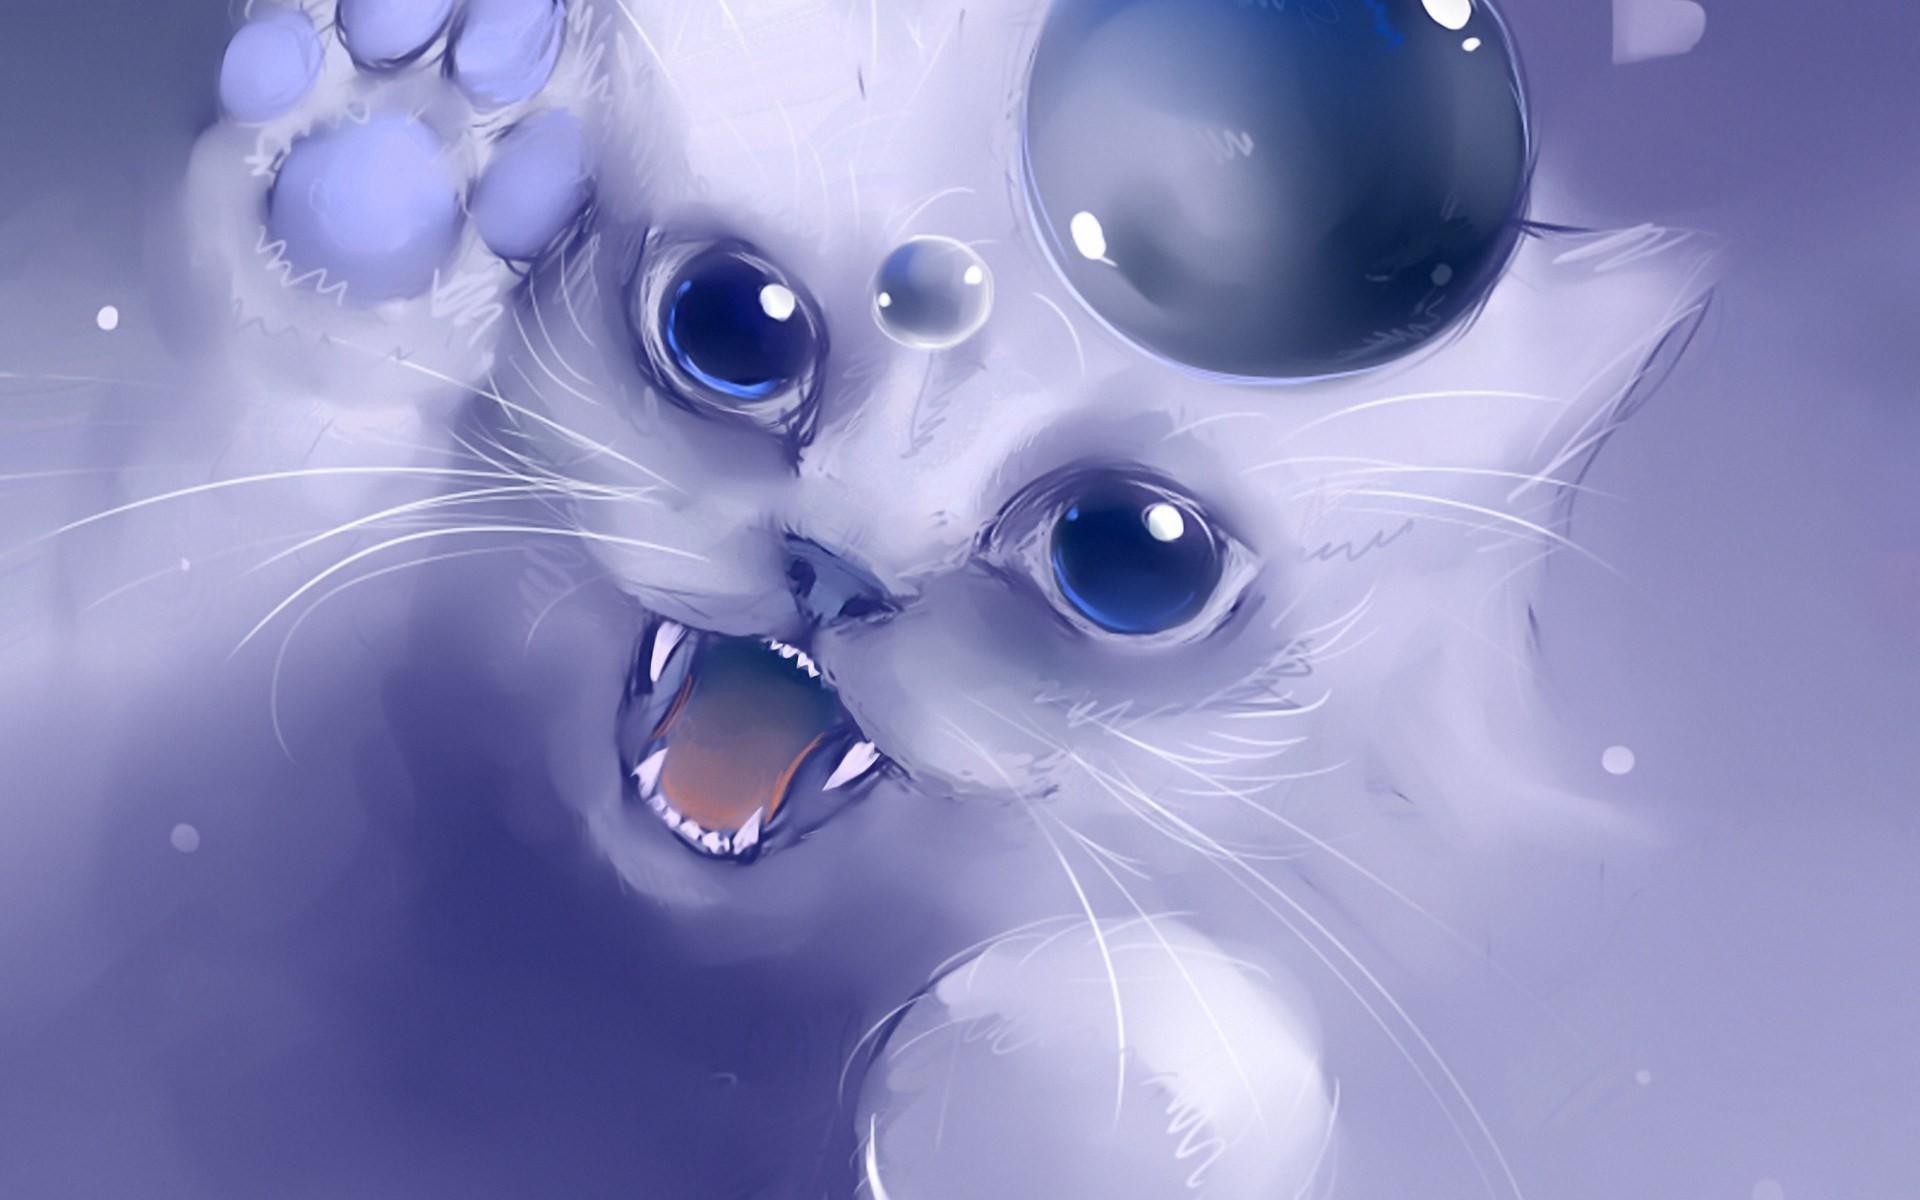 Cats images photos for girls desktop wallpaper